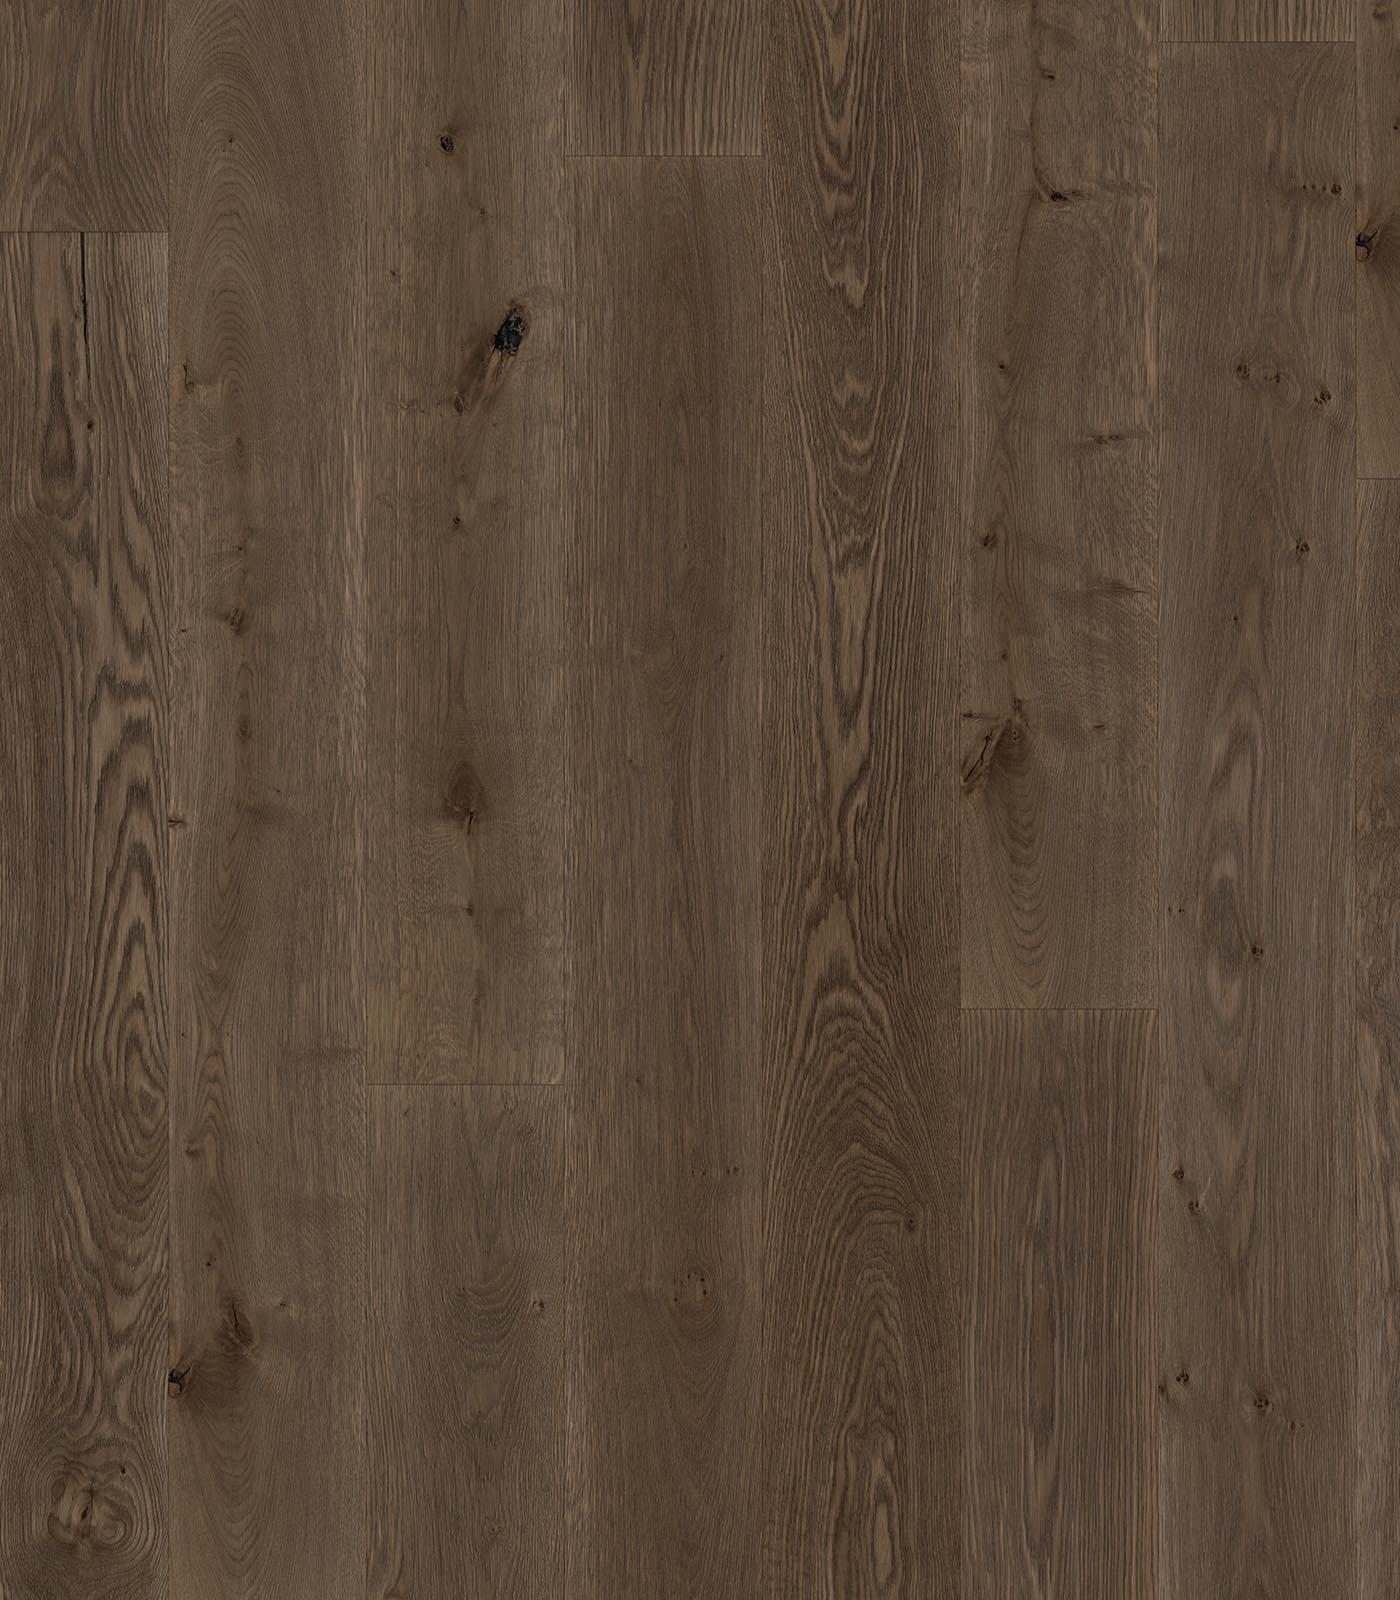 Sarasota-European Oak floors-Lifestyle Collection-flat